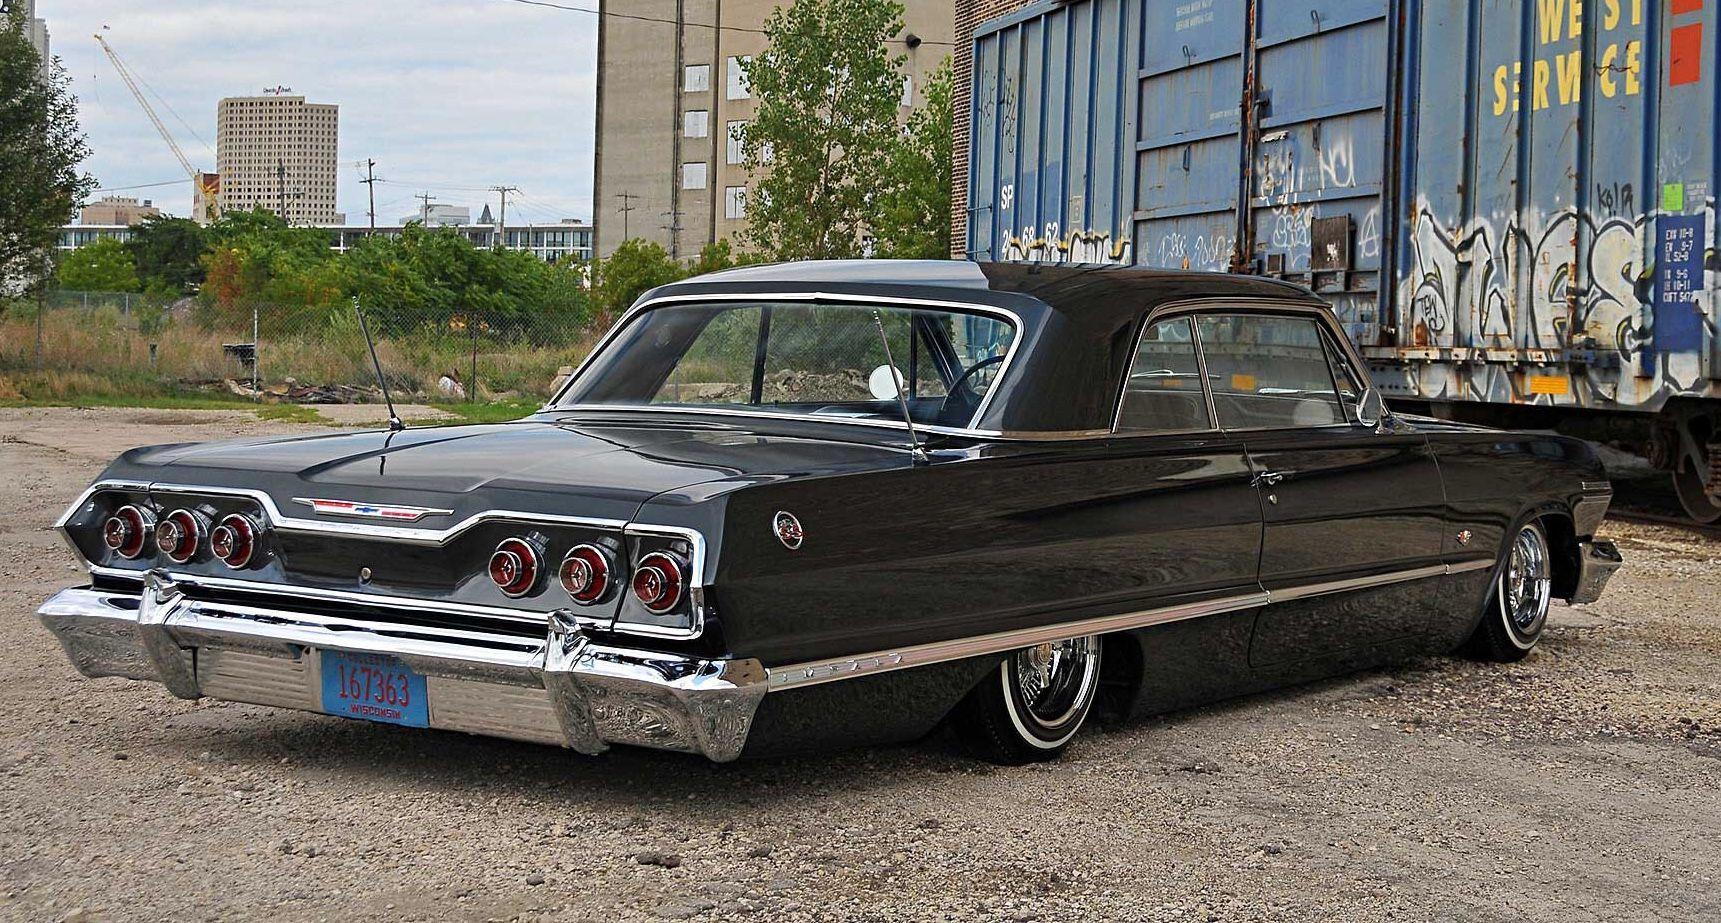 1963 Chevy Impala Chevroletimpala1963 Chevrolet Impala 1963